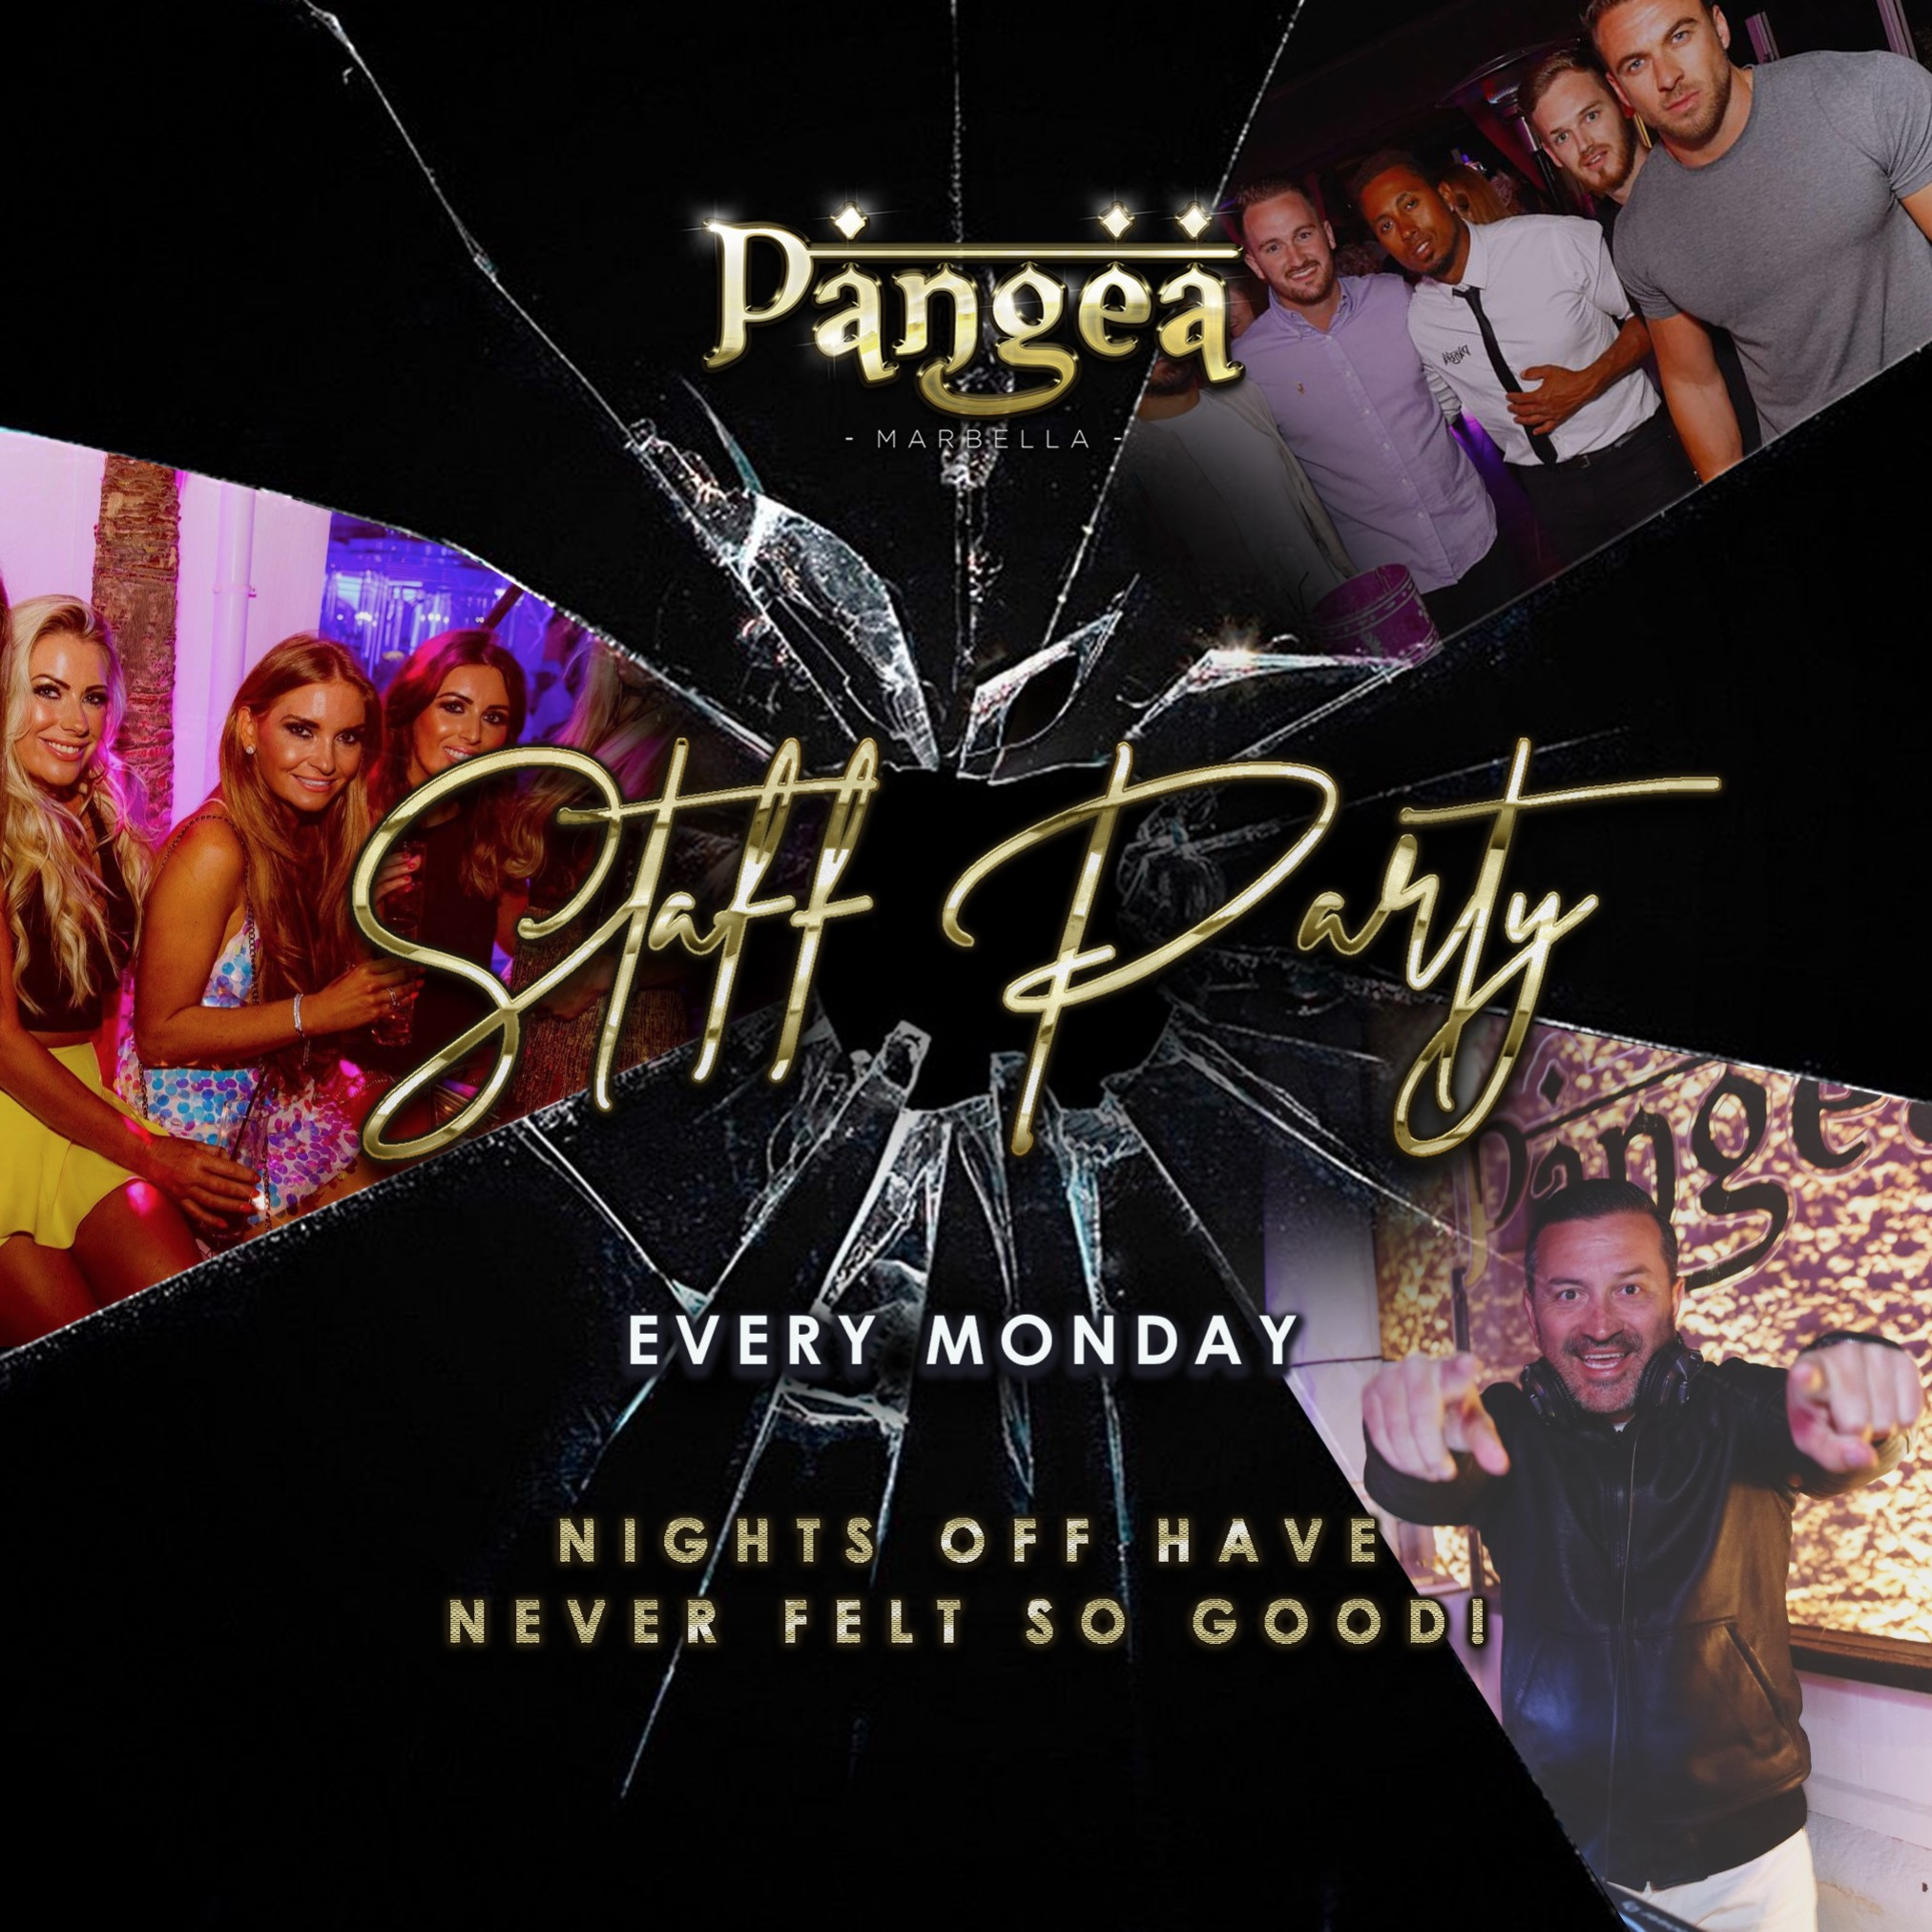 Every Monday at Pangea